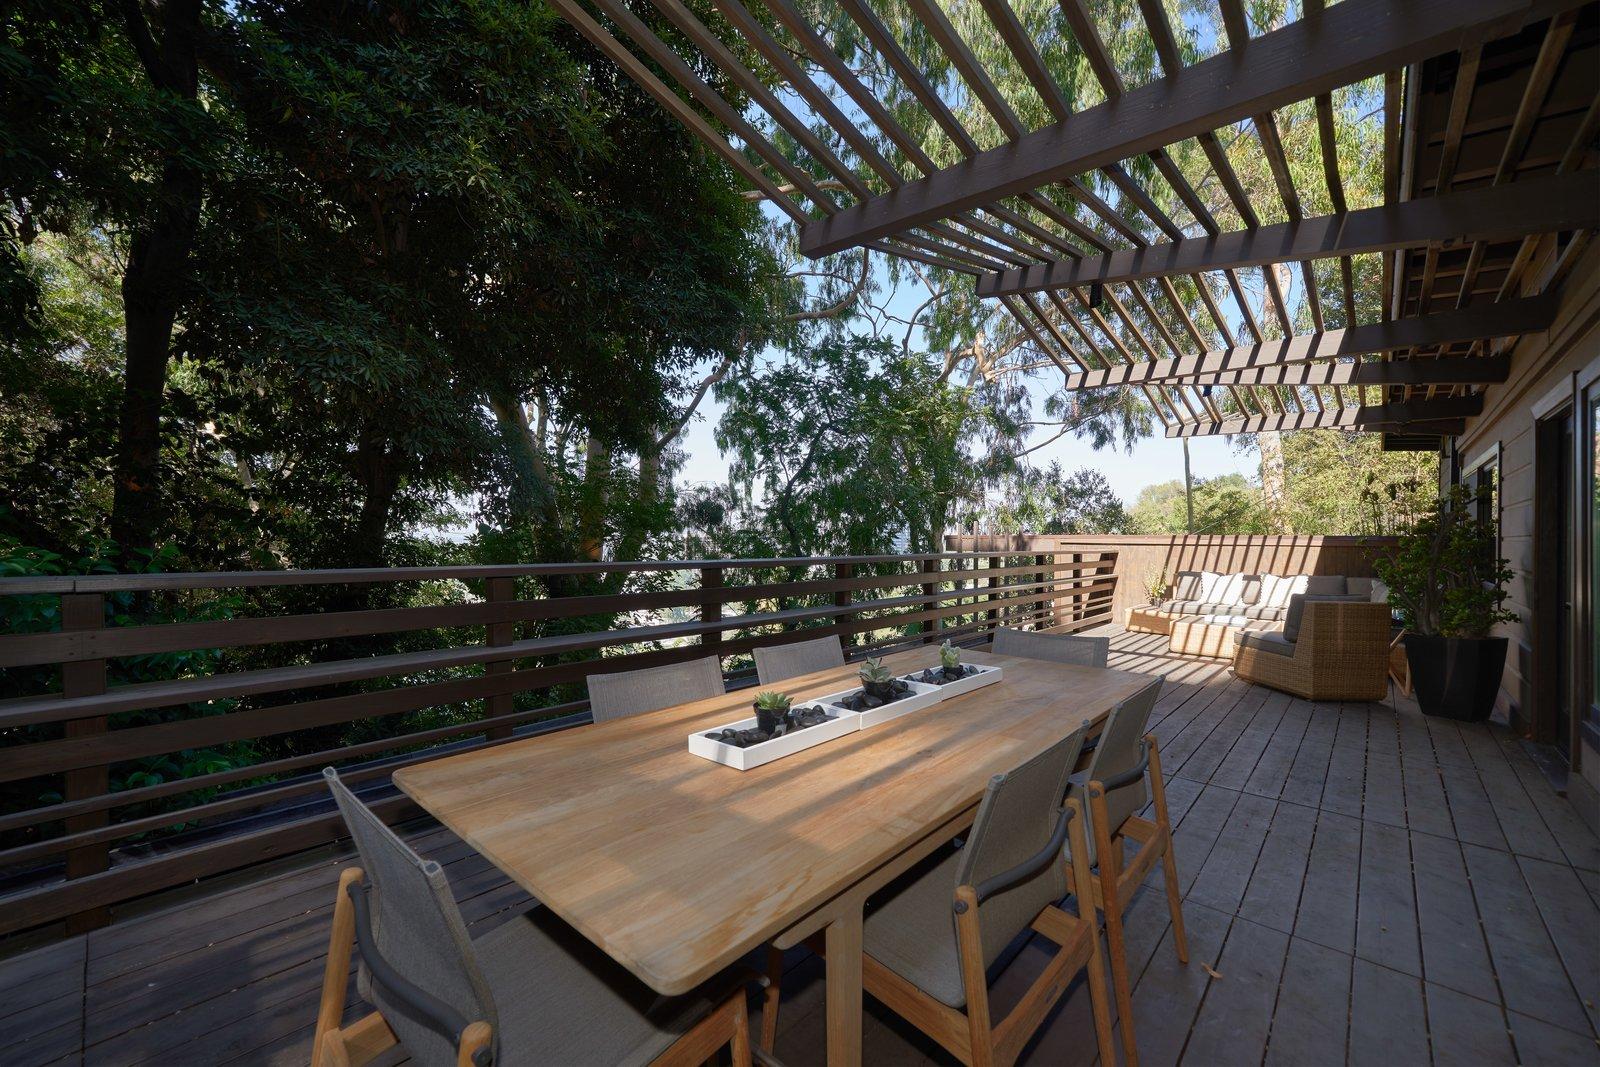 Millard Kaufman Residence deck